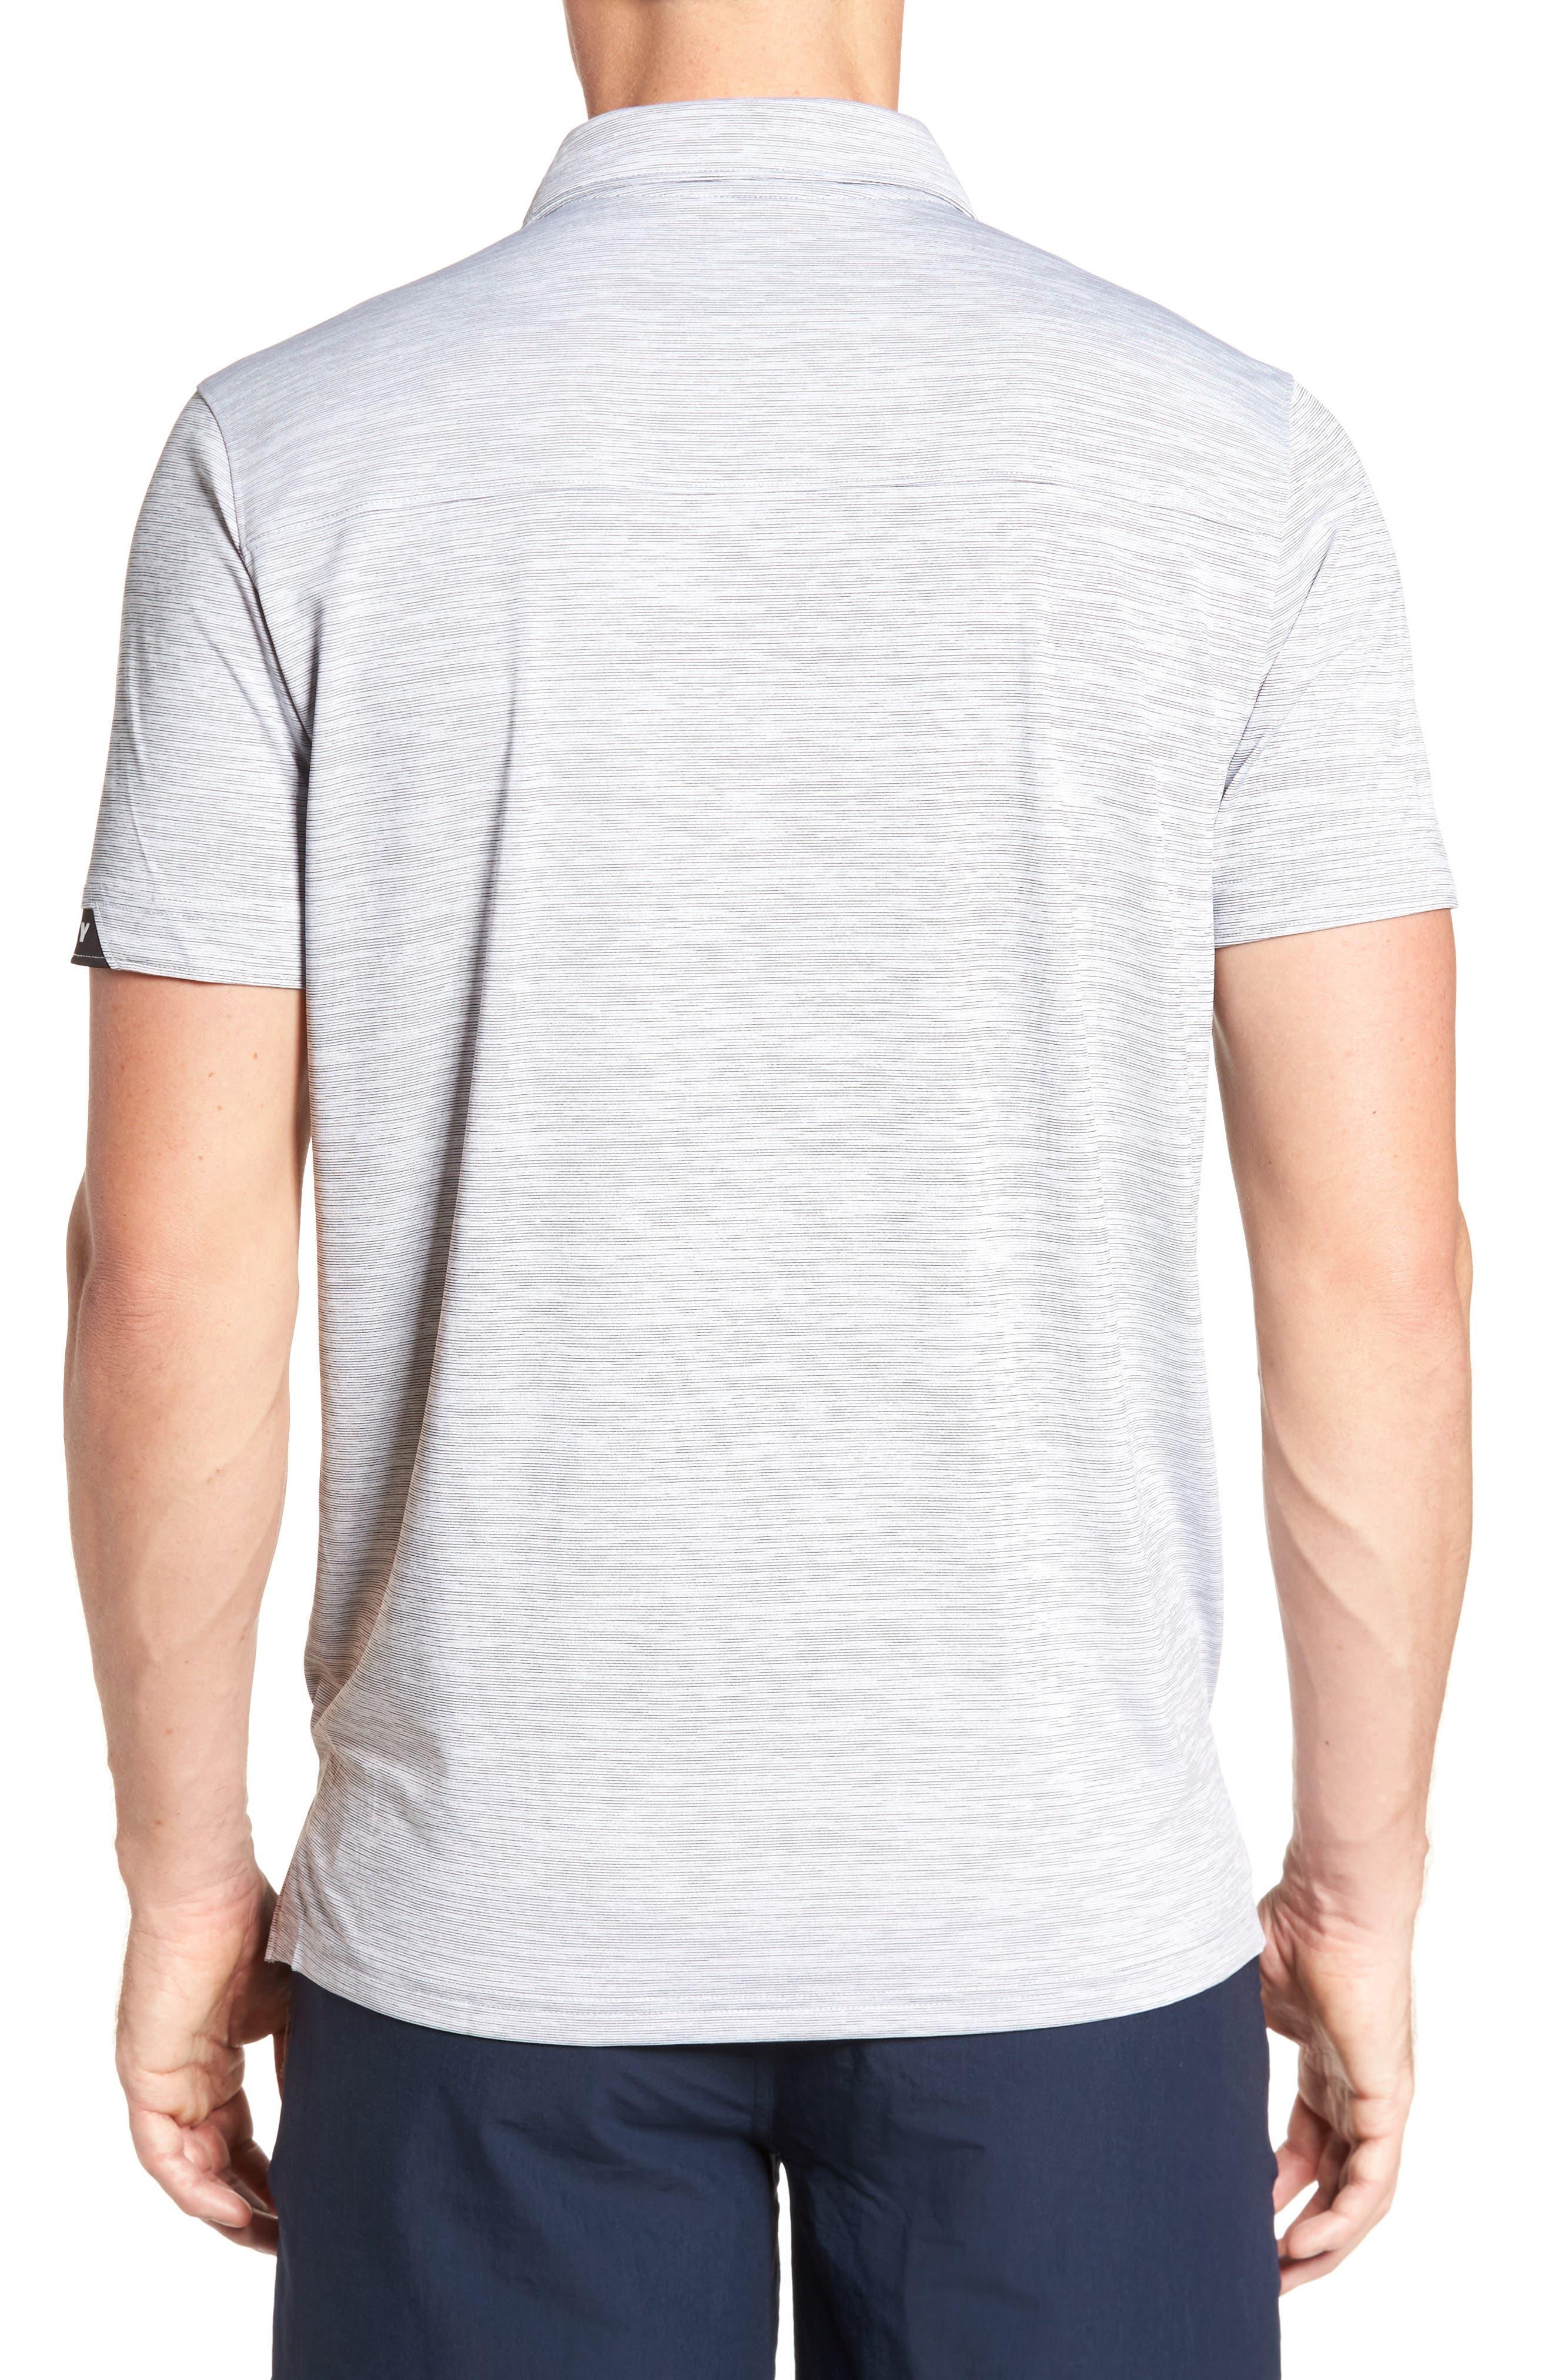 Gravity Polo Shirt,                             Alternate thumbnail 2, color,                             BLACKOUT